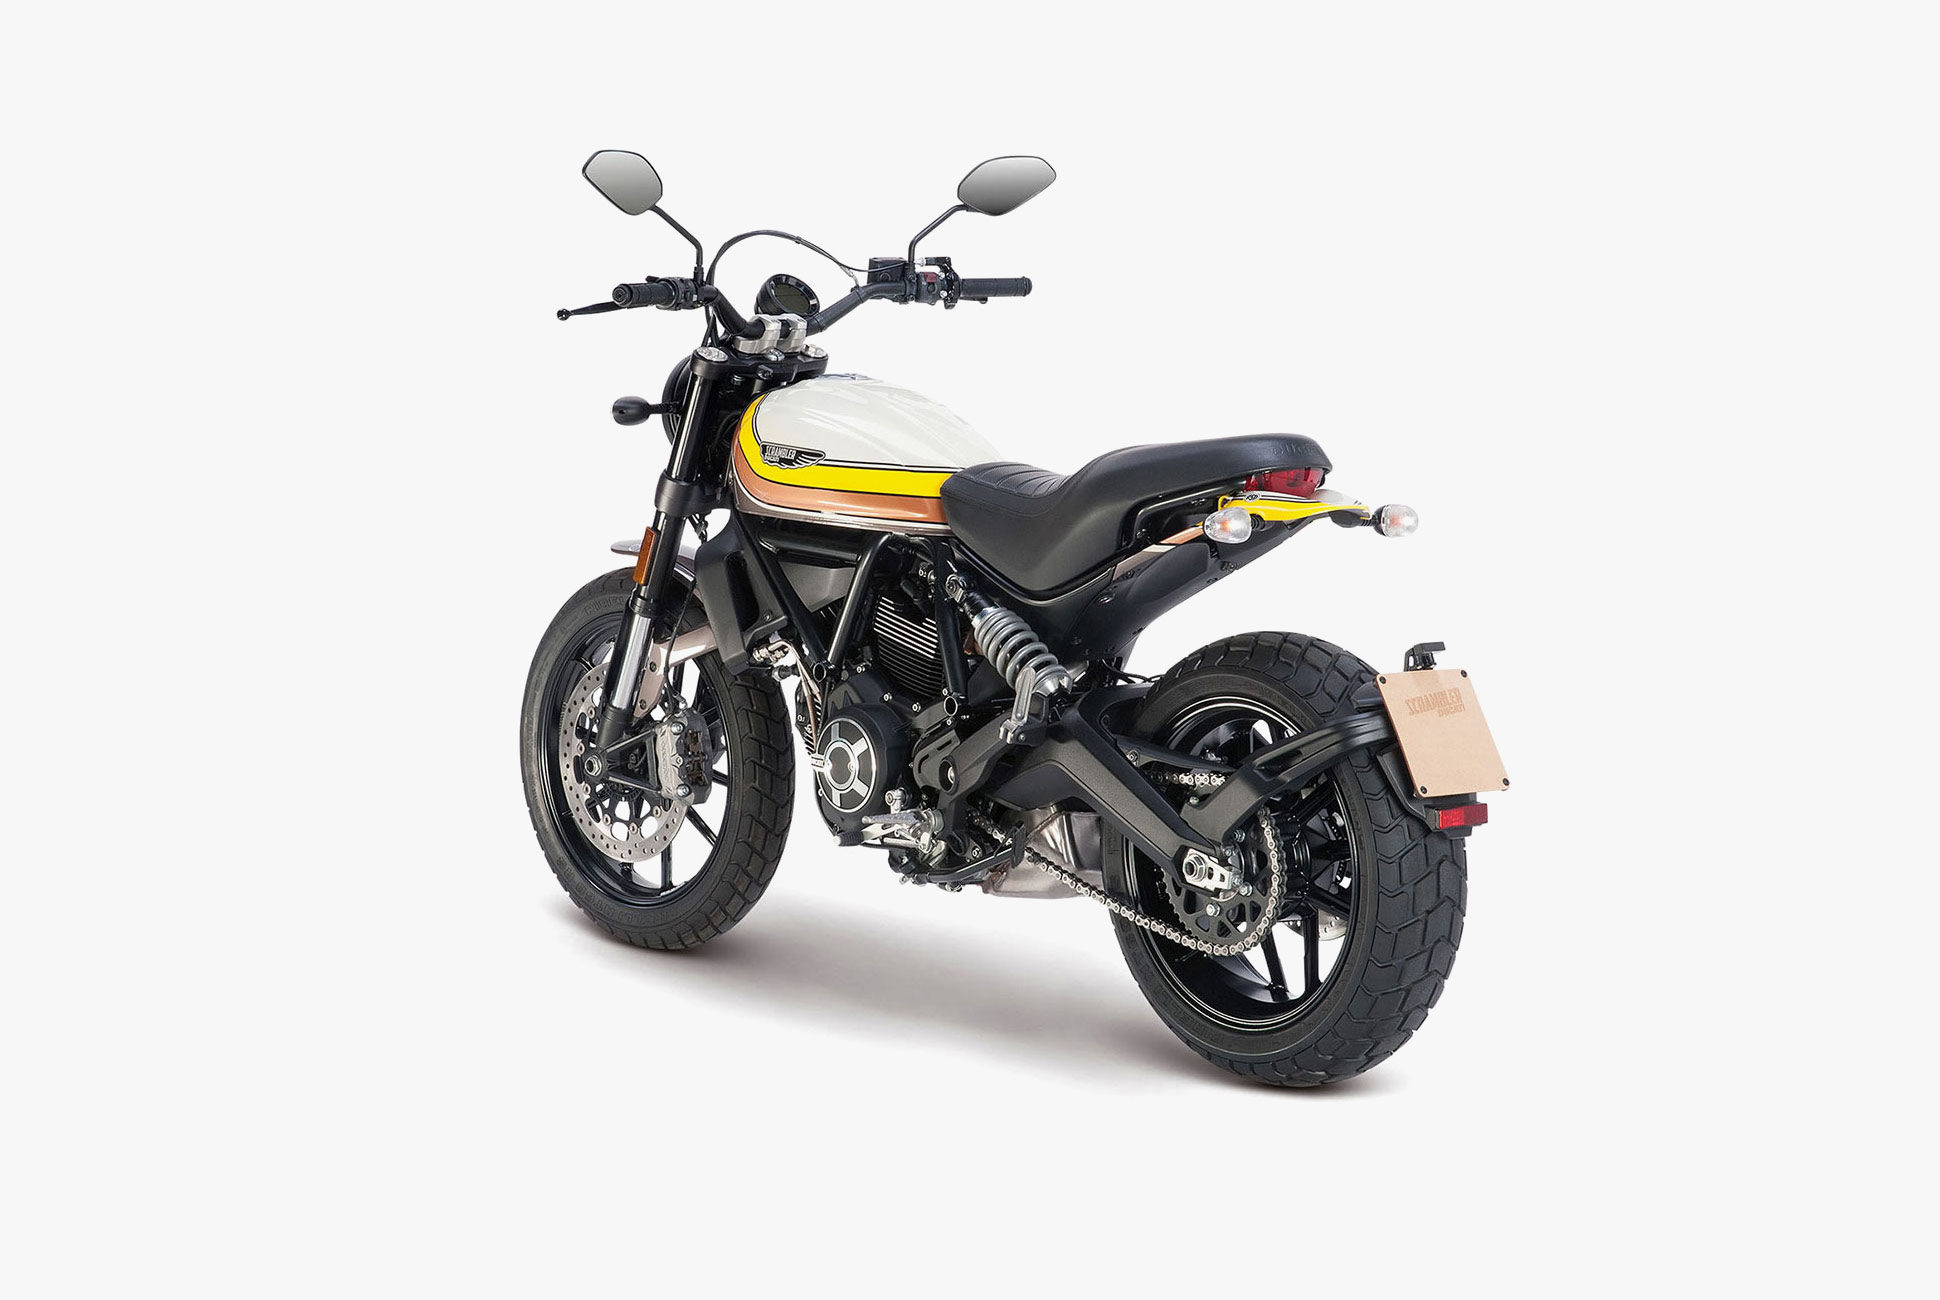 Ducati-Scrambler-gear-patrol-4-1940x1300.jpg